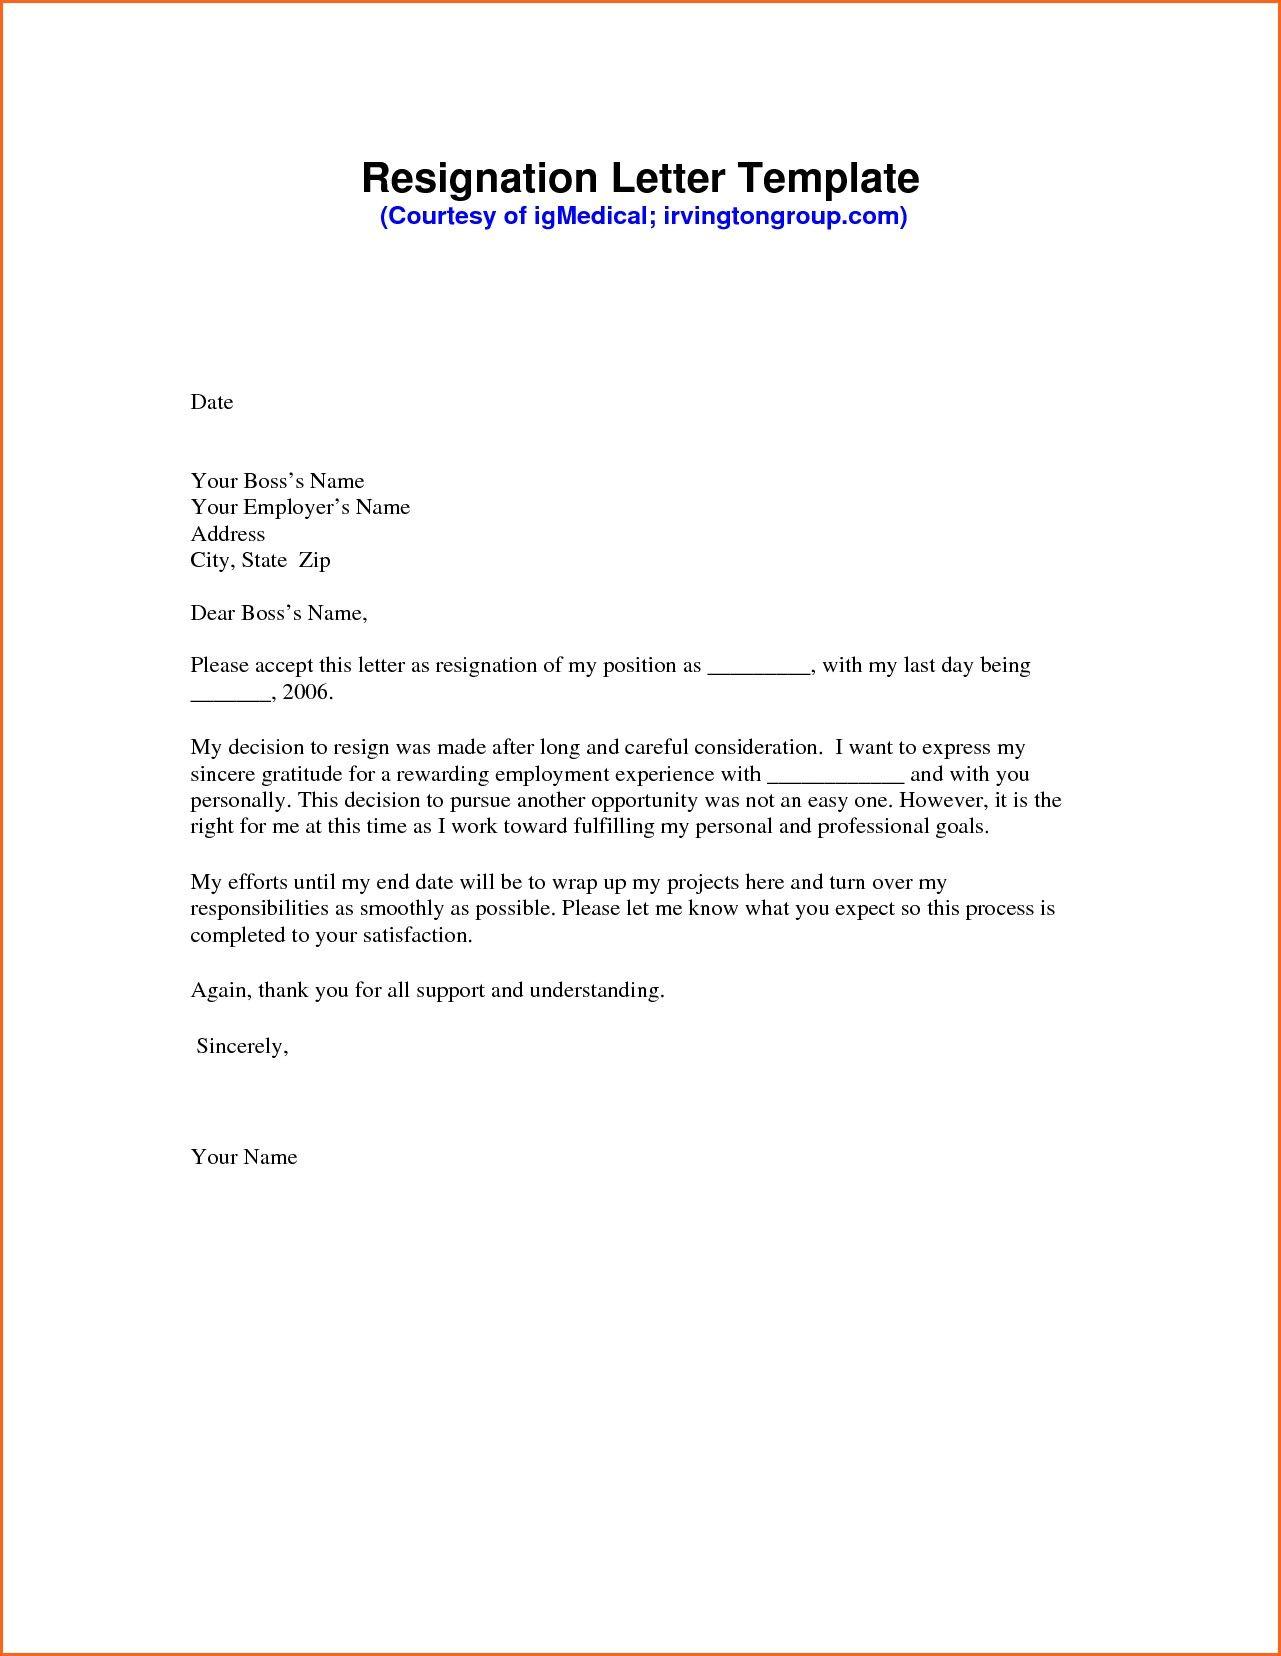 New Resignation Letter Immediate Resignation Template